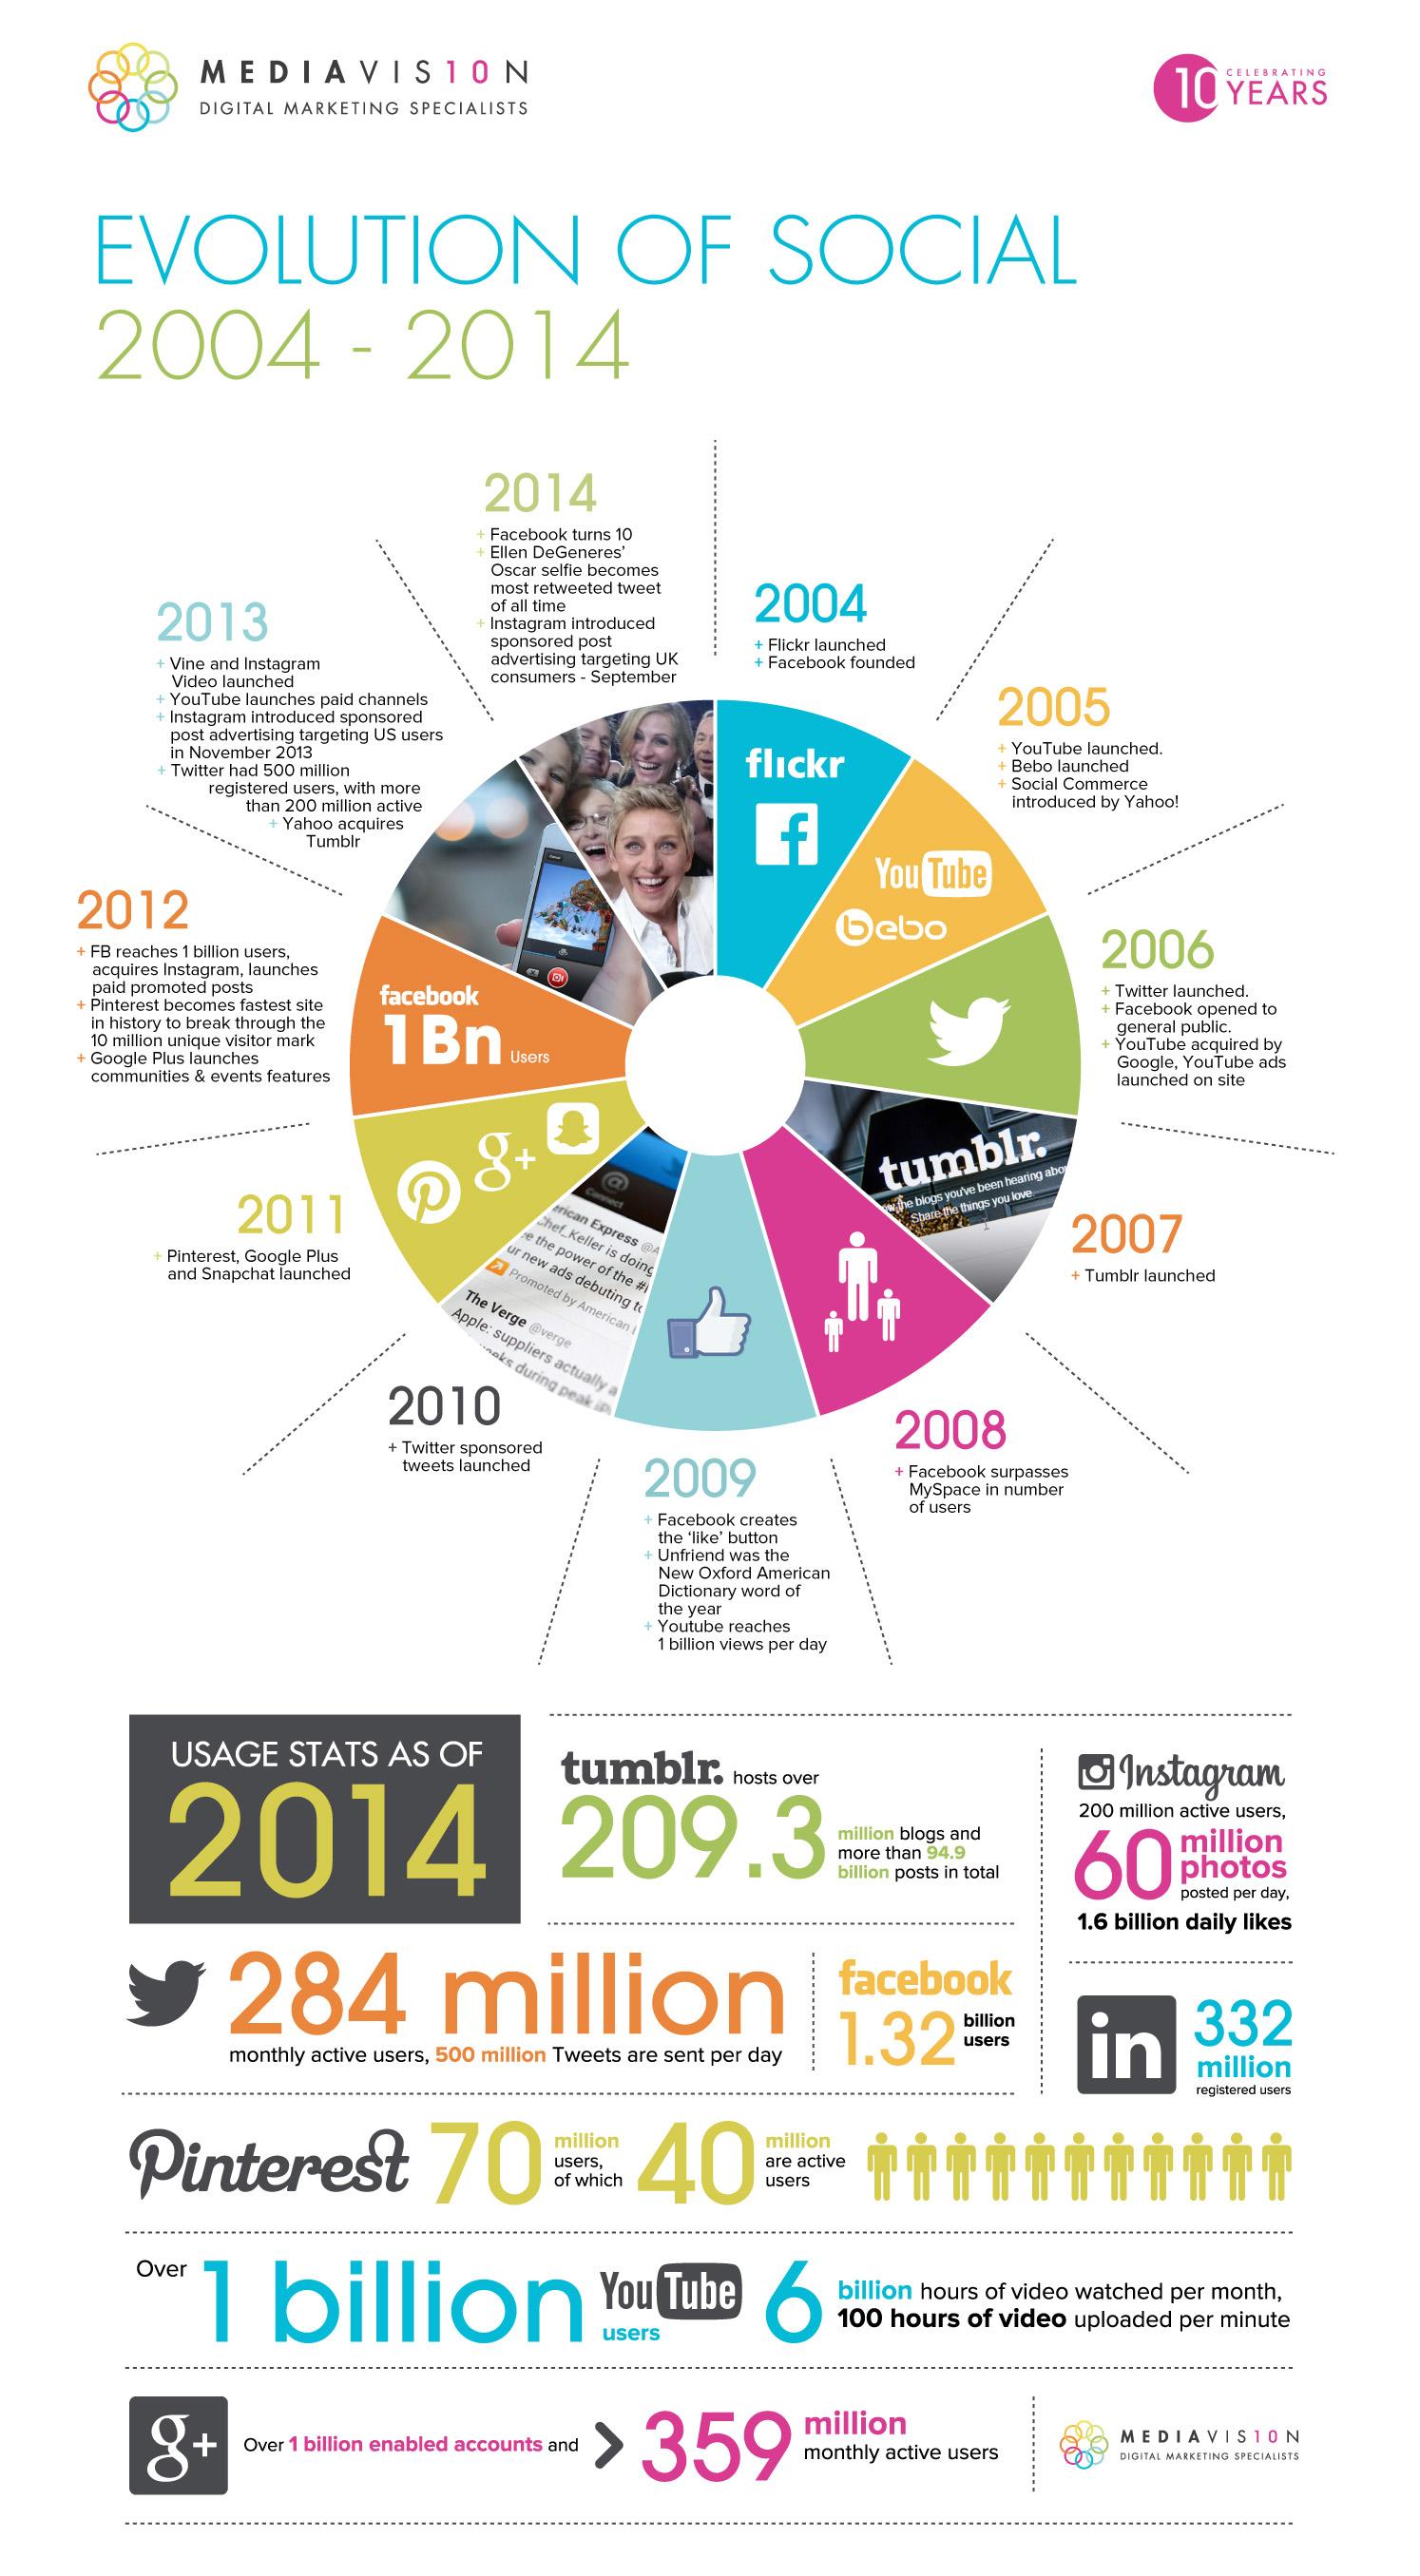 historia-midia-social-2004-2014